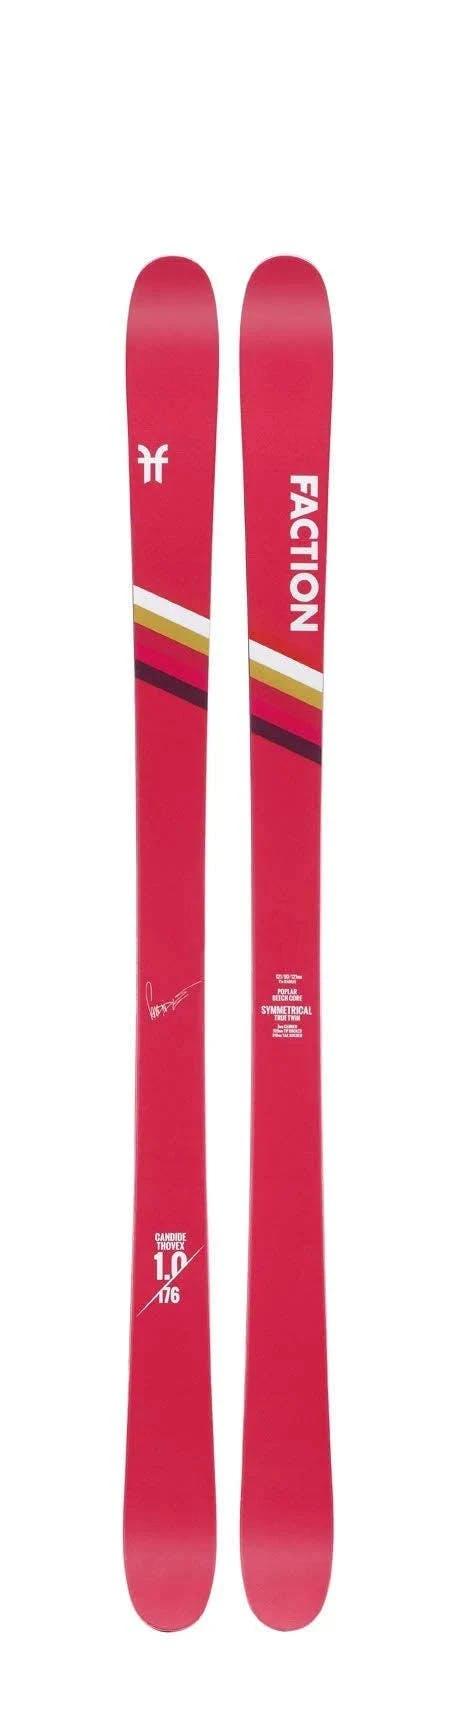 Faction Ski Candide 1.0 Skis